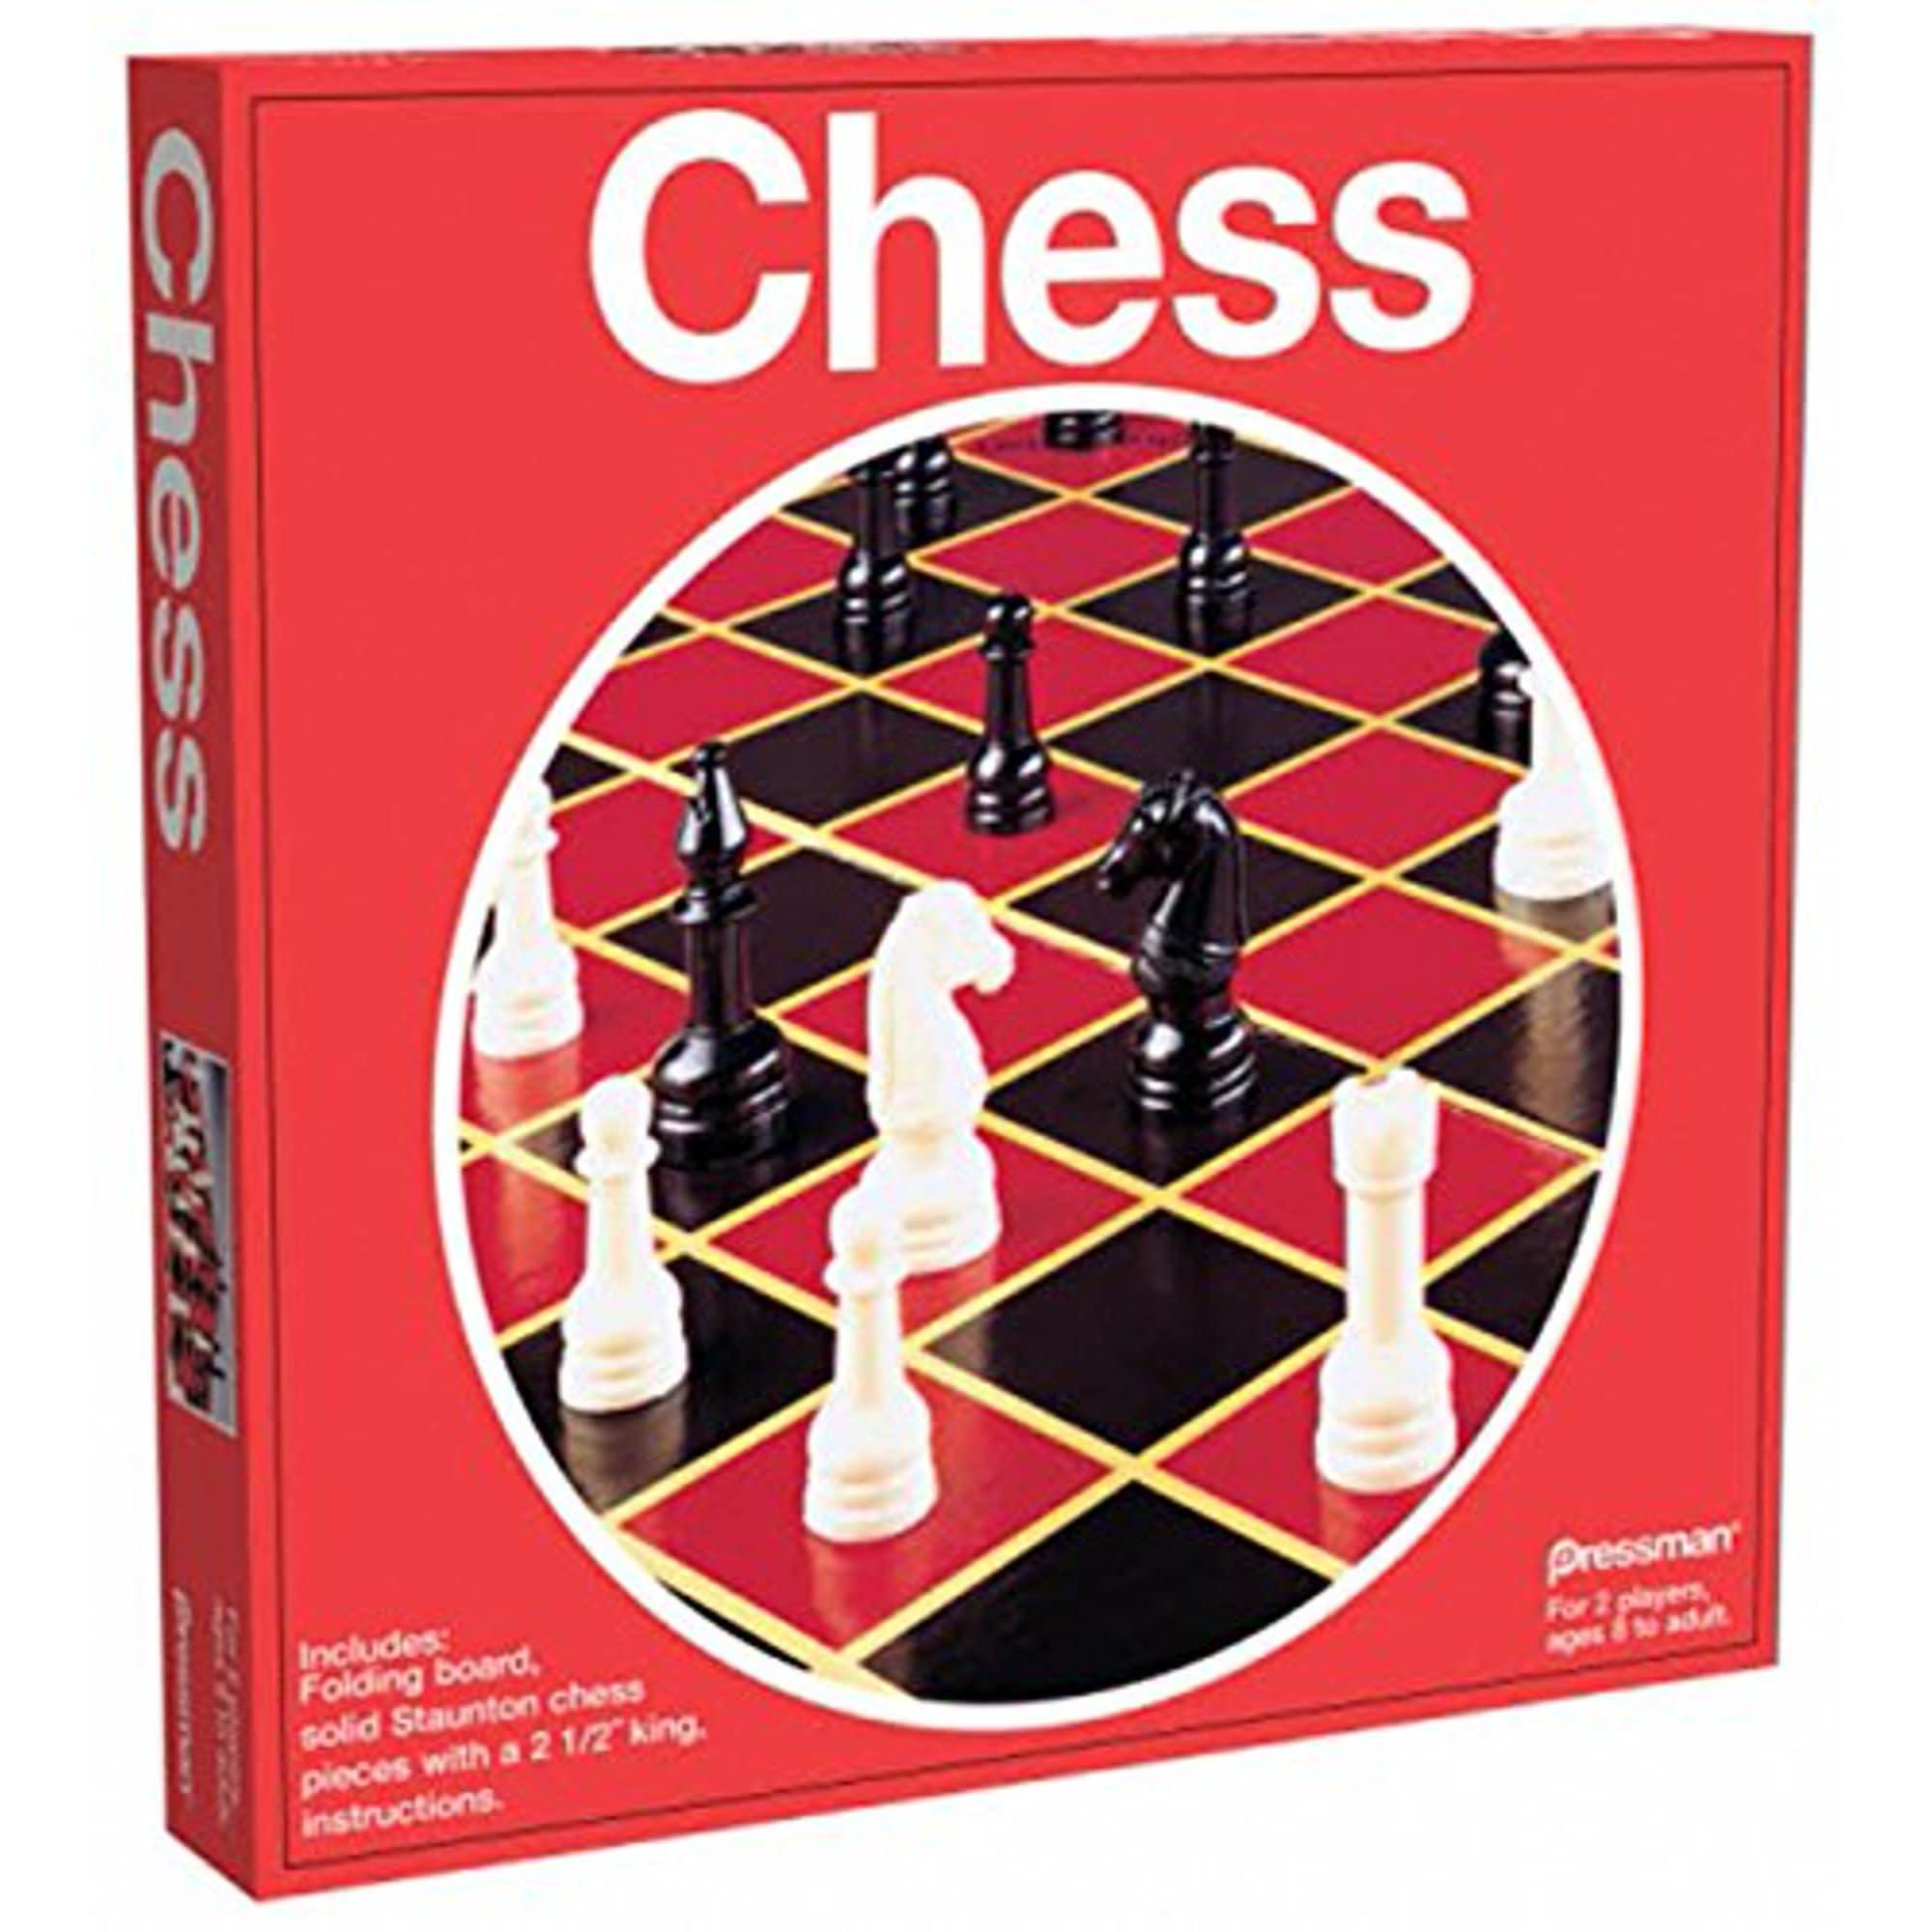 Echecs pliant, chess w/ Folding Board (Red Box)